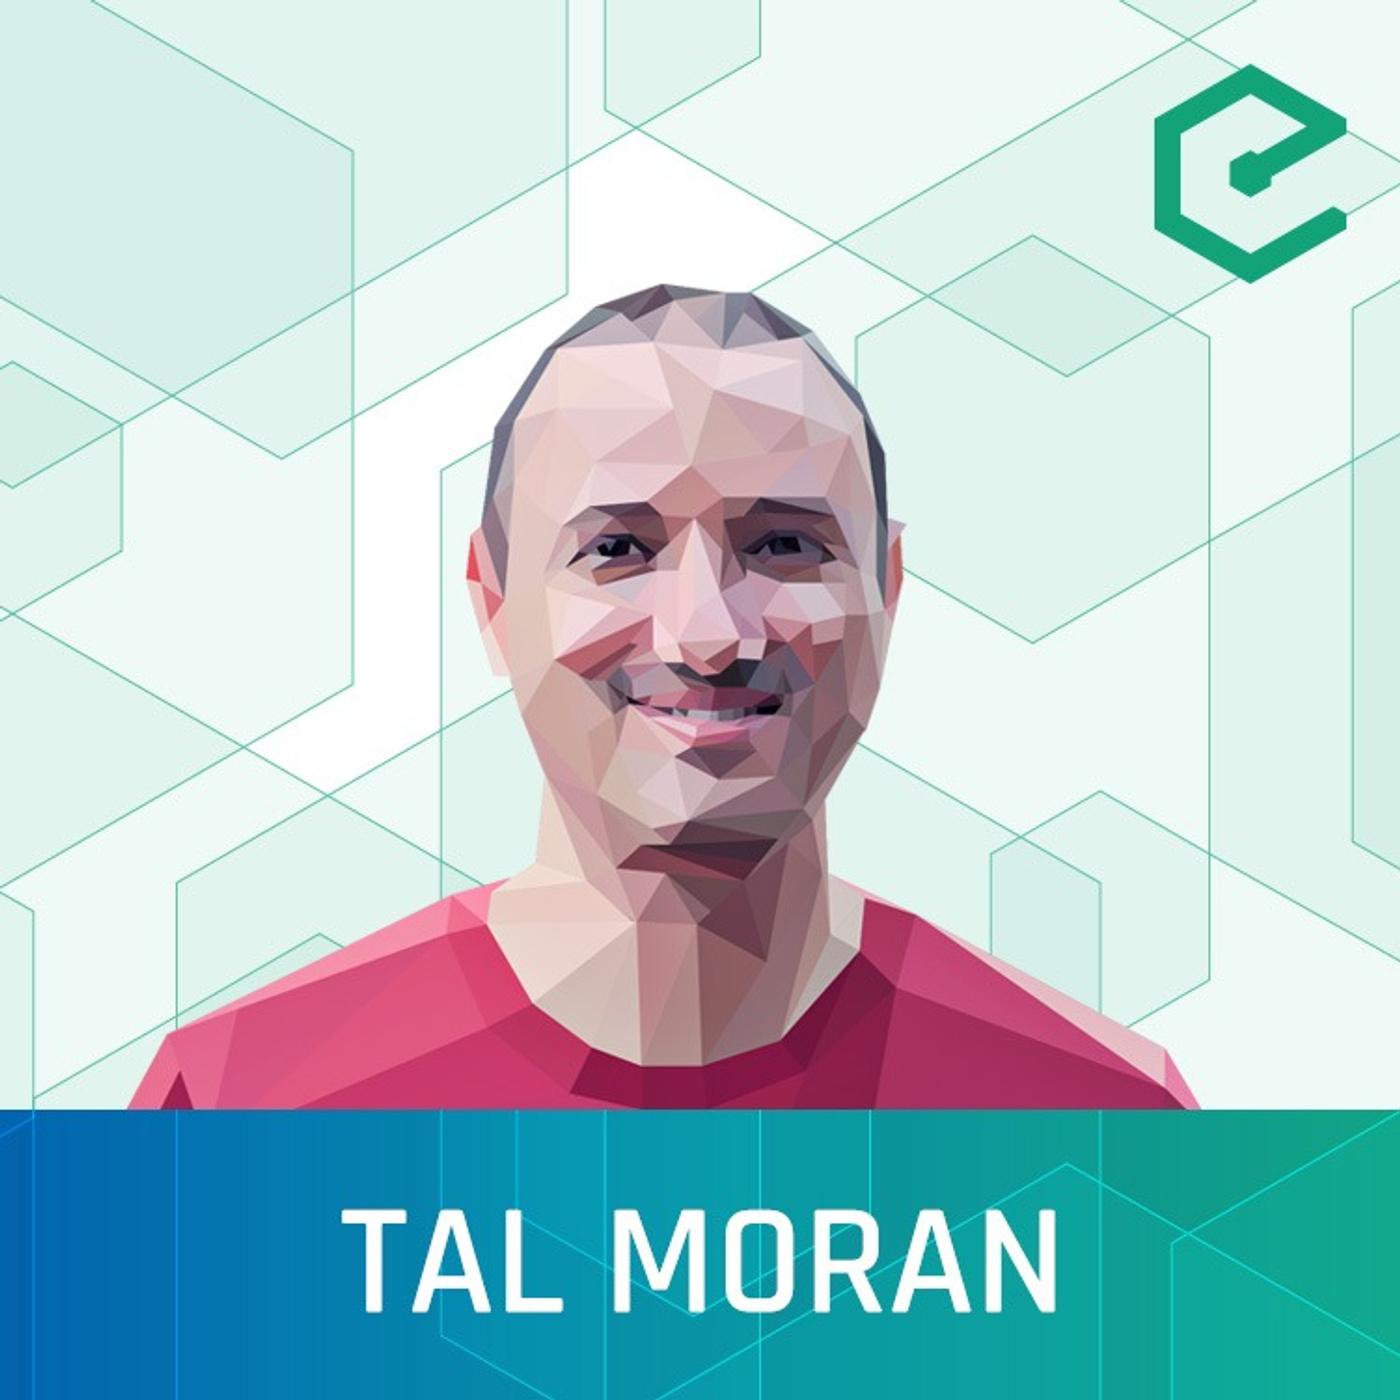 Tal Moran: Spacemesh – The Space-Time Consensus Blockchain